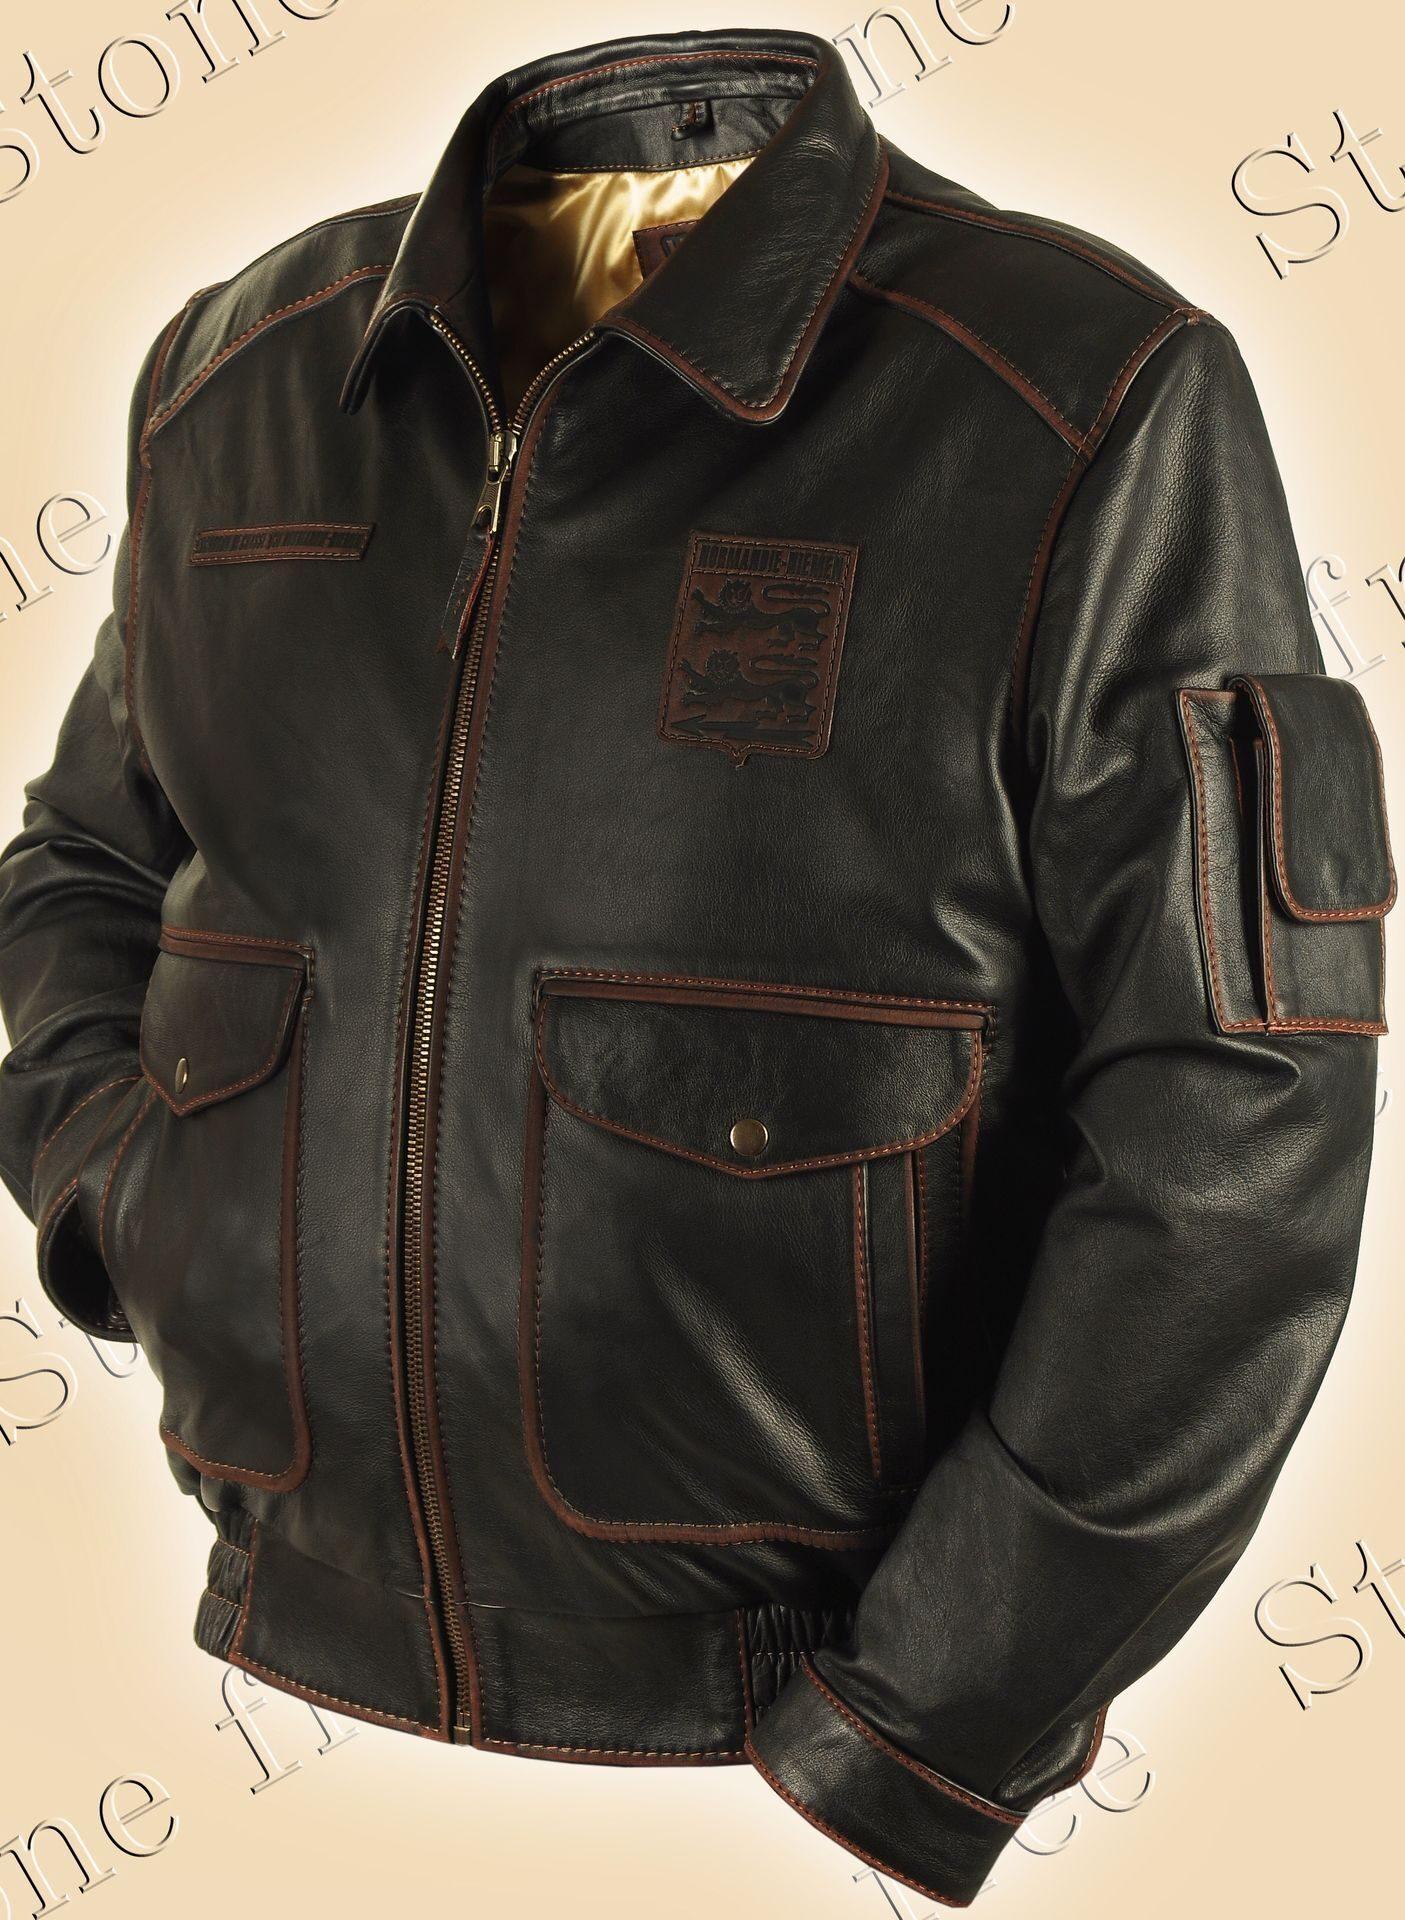 Купить Куртку Из Кожи Буйвола Зимнюю